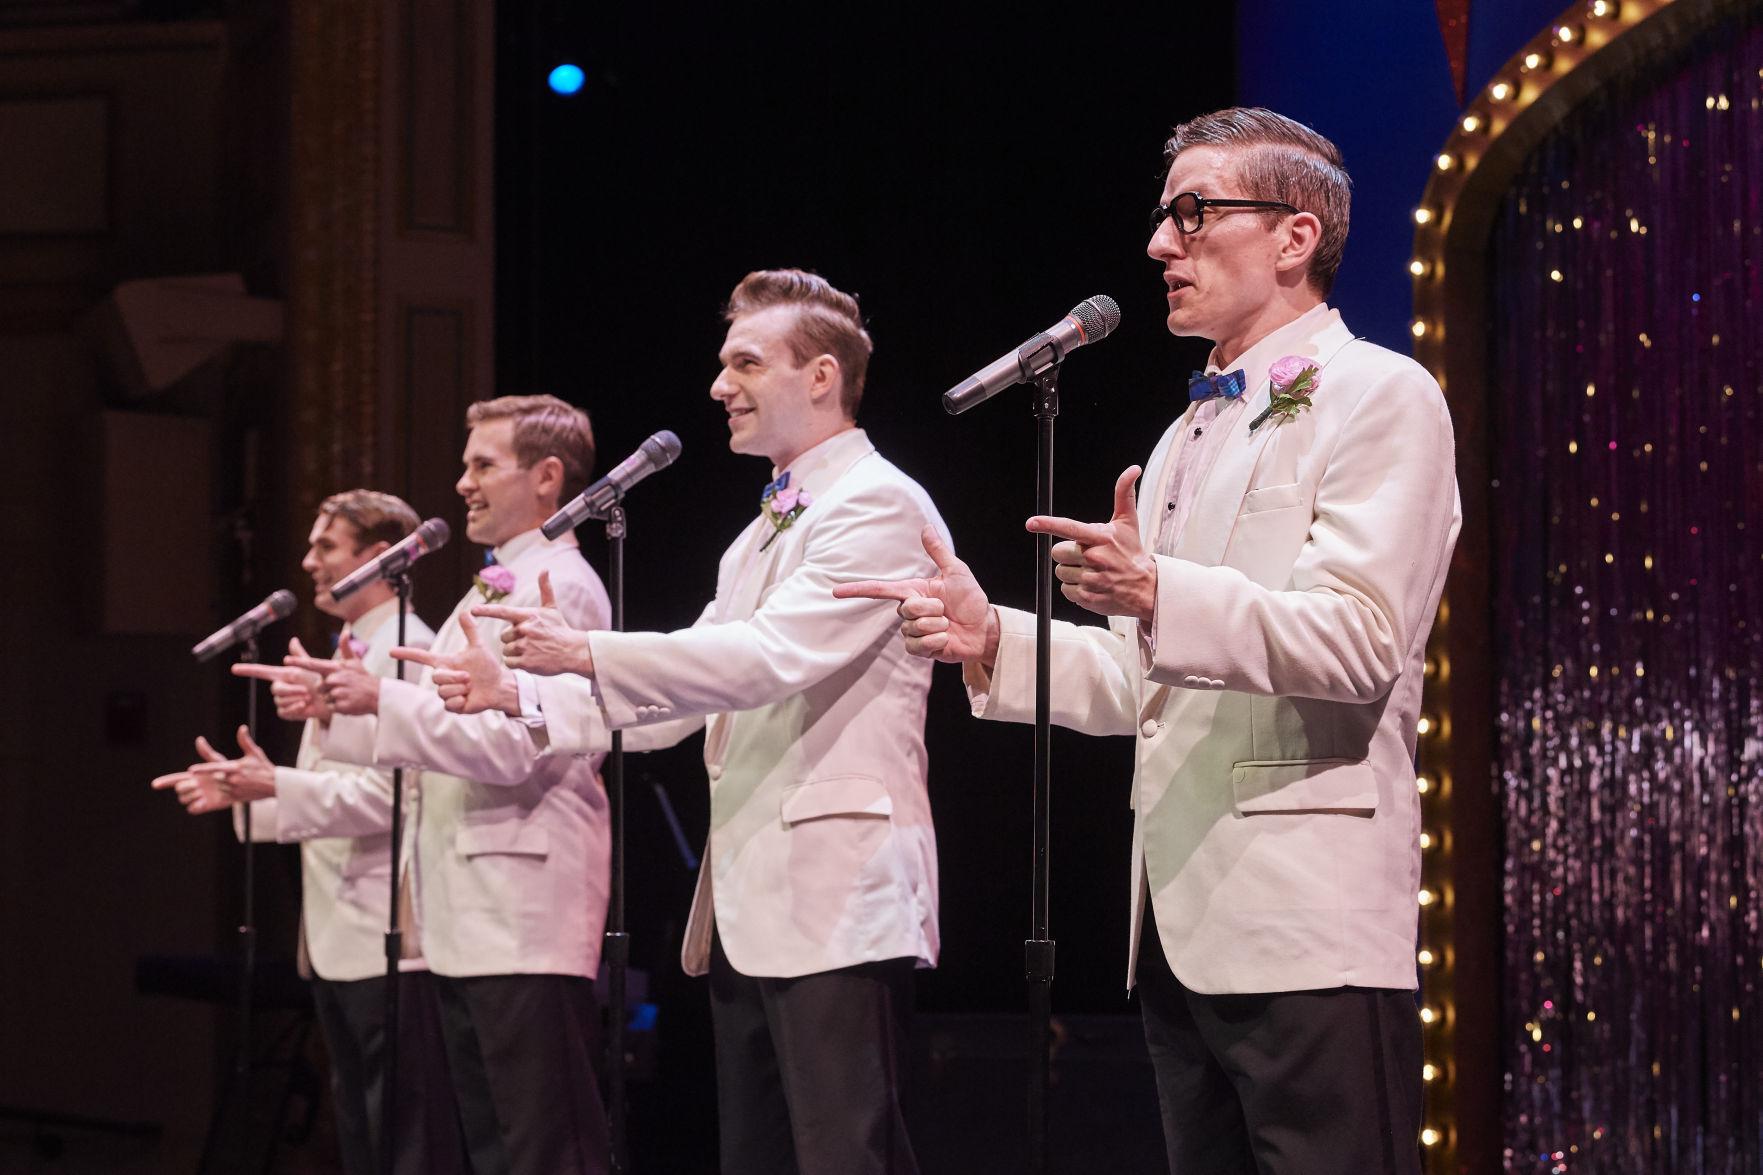 From left, Mickey Patrick Ryan, Andrew Kotzen, Mack Shirilla and James Penca. Photo | Roger Mastroianni